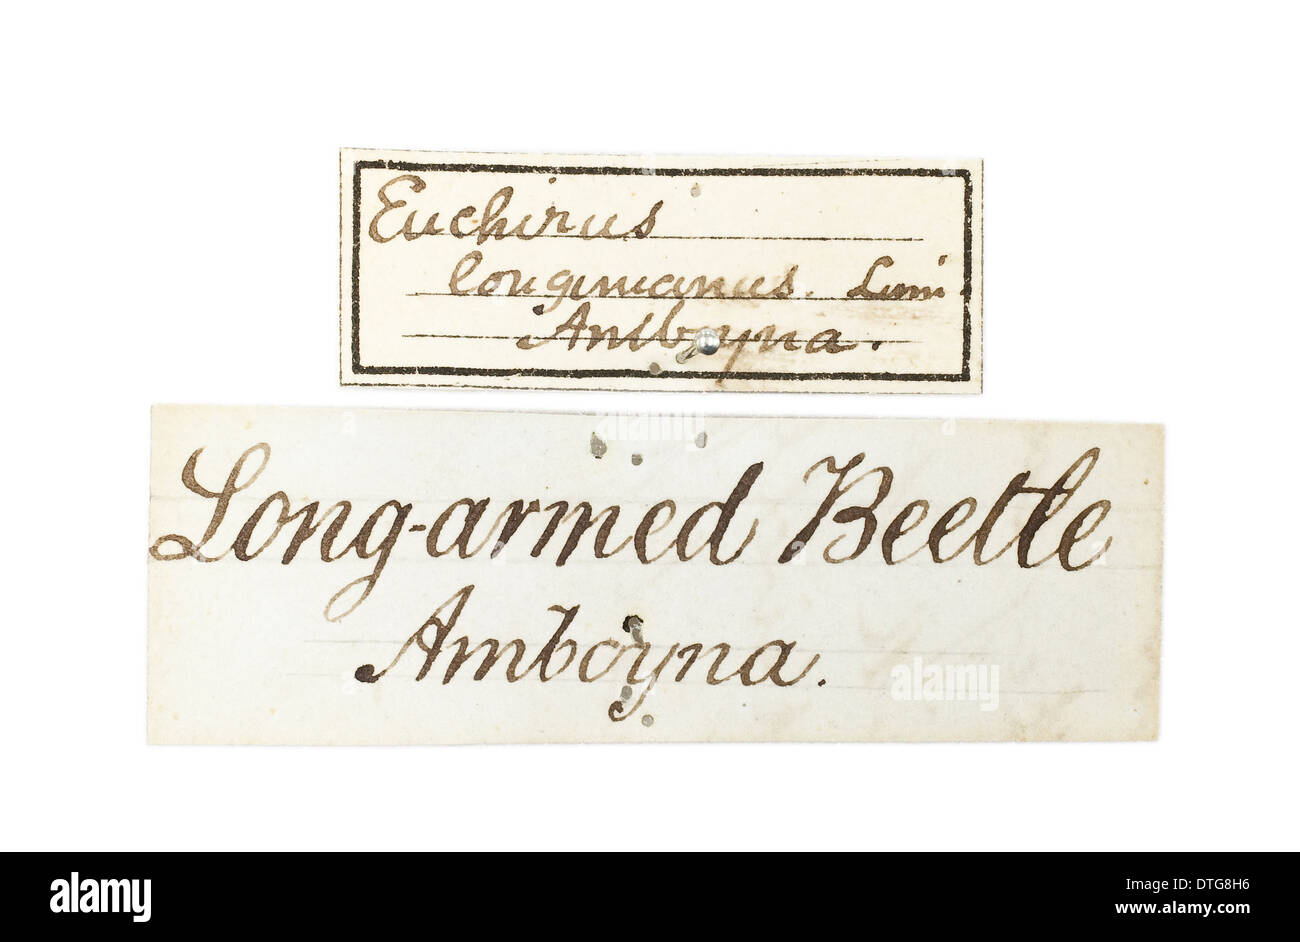 Etiqueta para Euchirus longimanus, Wallace's largo escarabajo armado Imagen De Stock